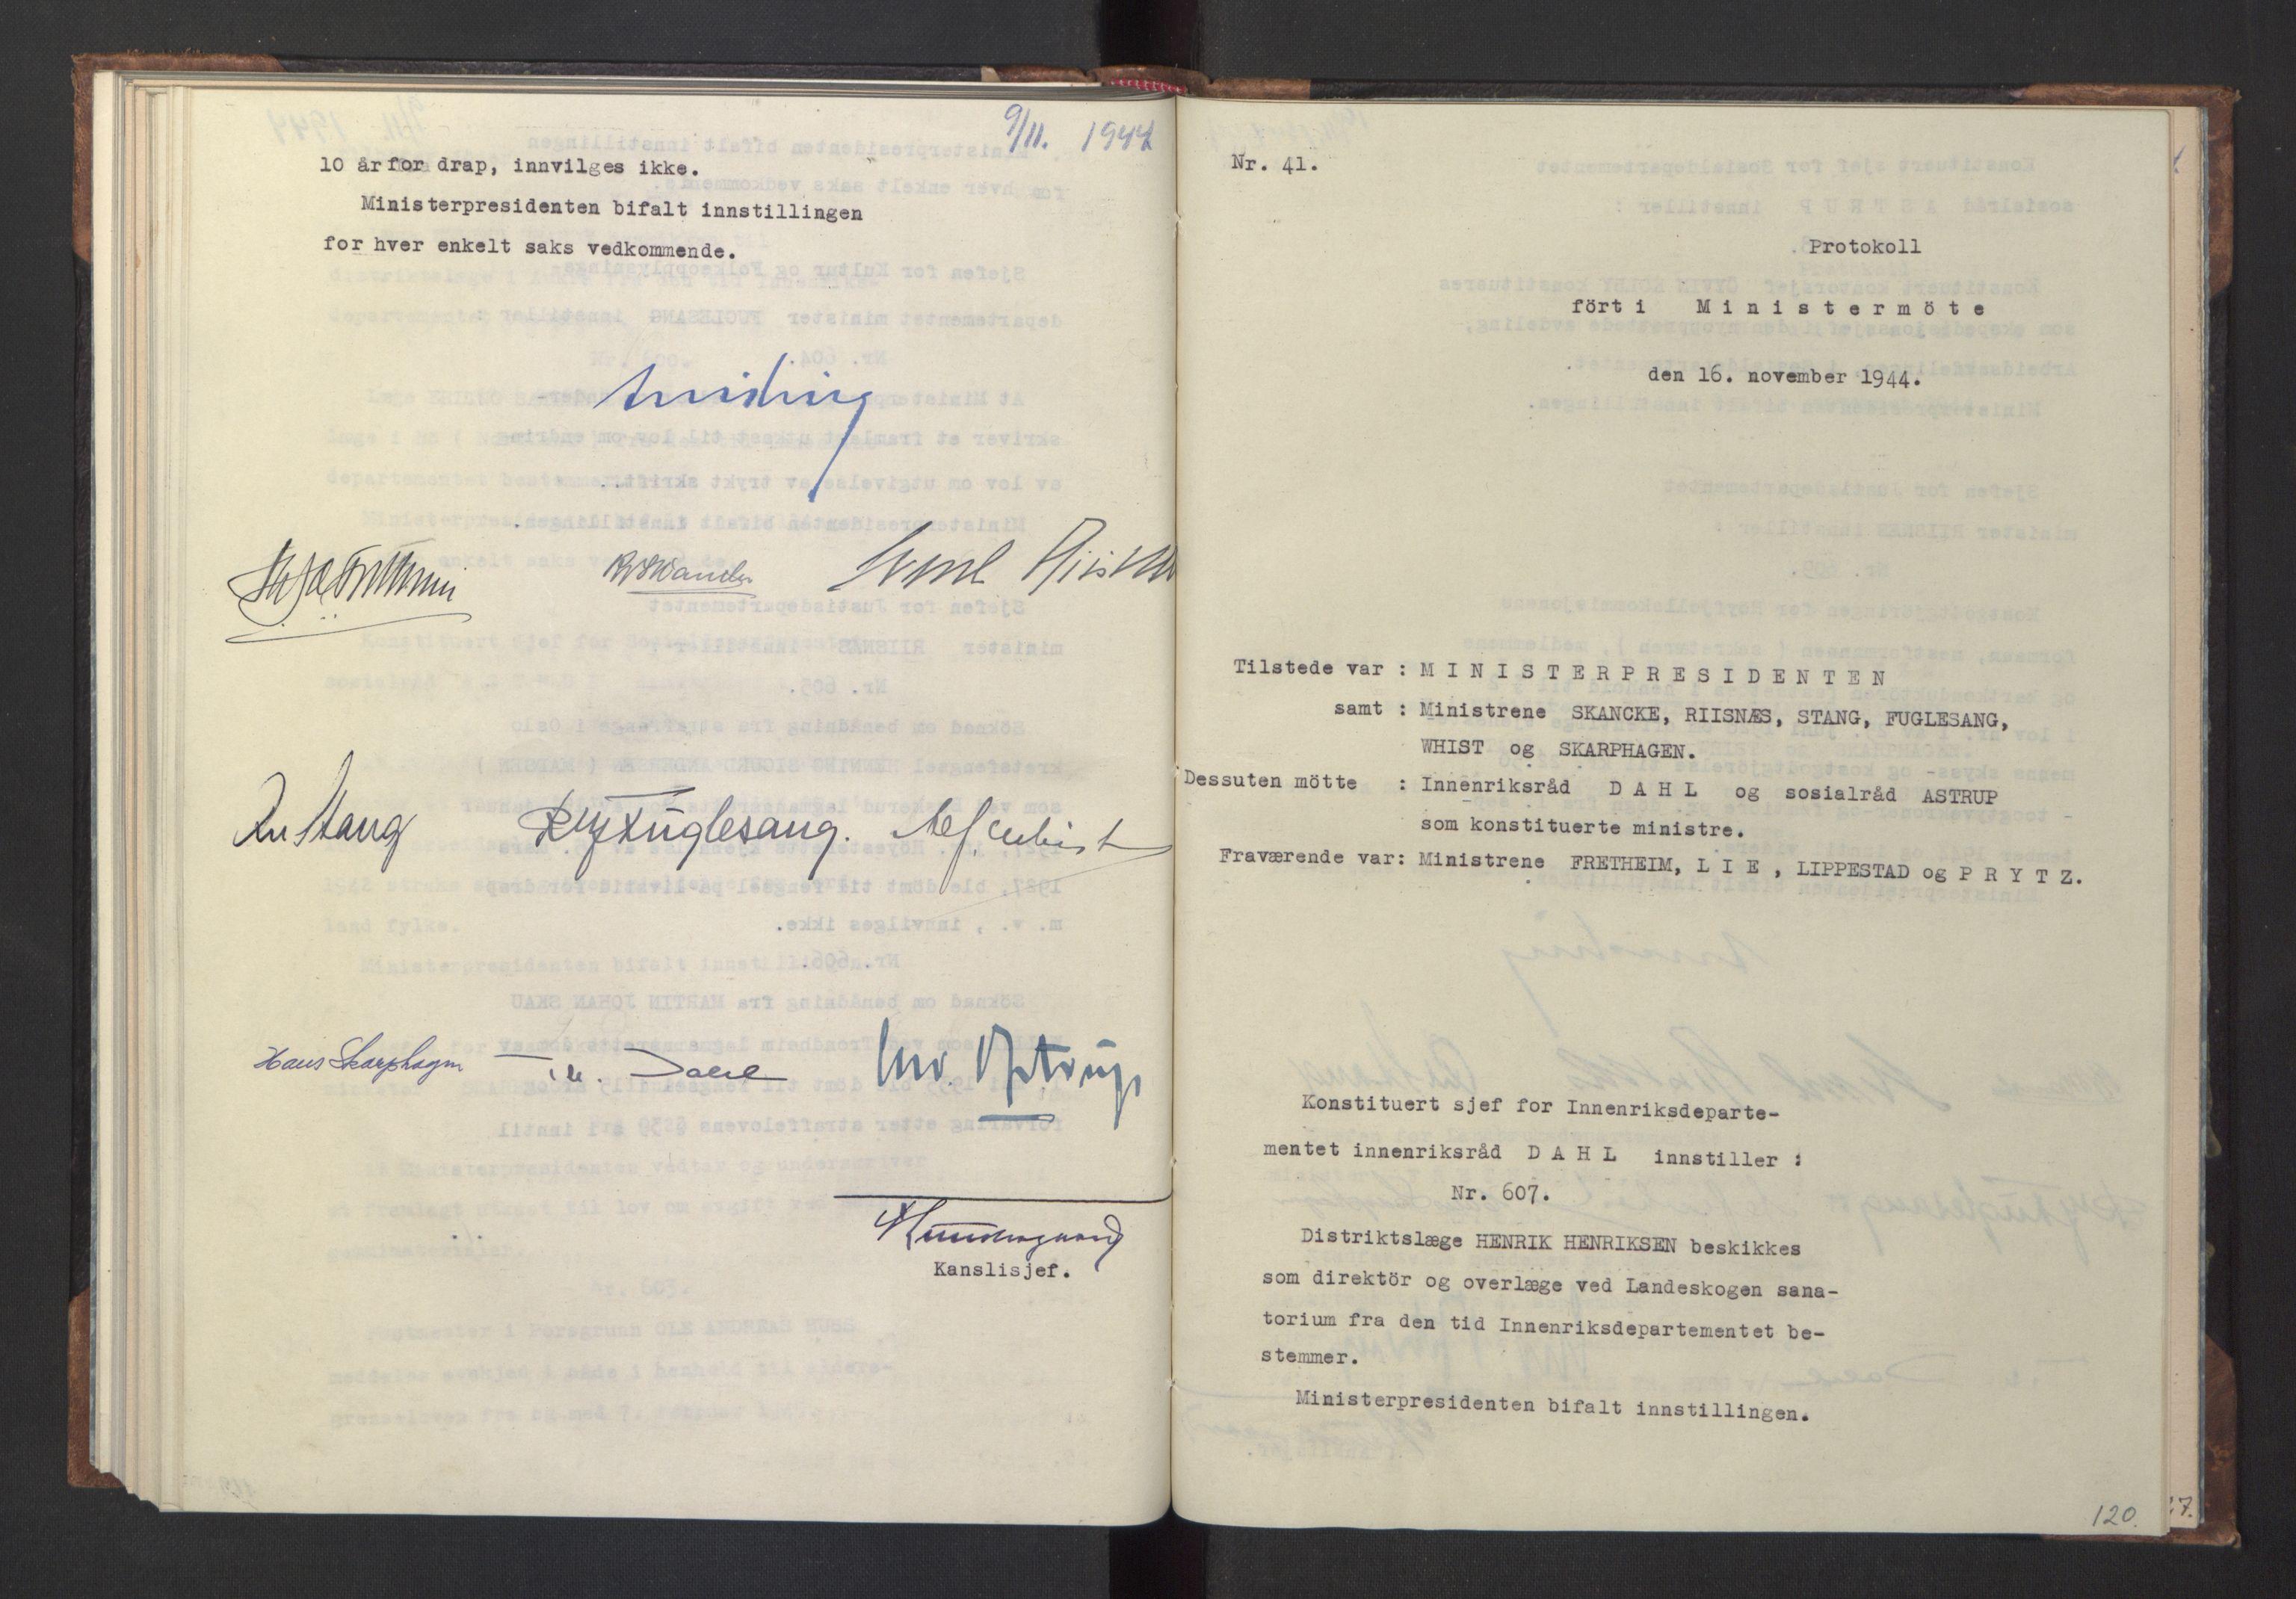 RA, NS-administrasjonen 1940-1945 (Statsrådsekretariatet, de kommisariske statsråder mm), D/Da/L0005: Protokoll fra ministermøter, 1944, s. 119b-120a